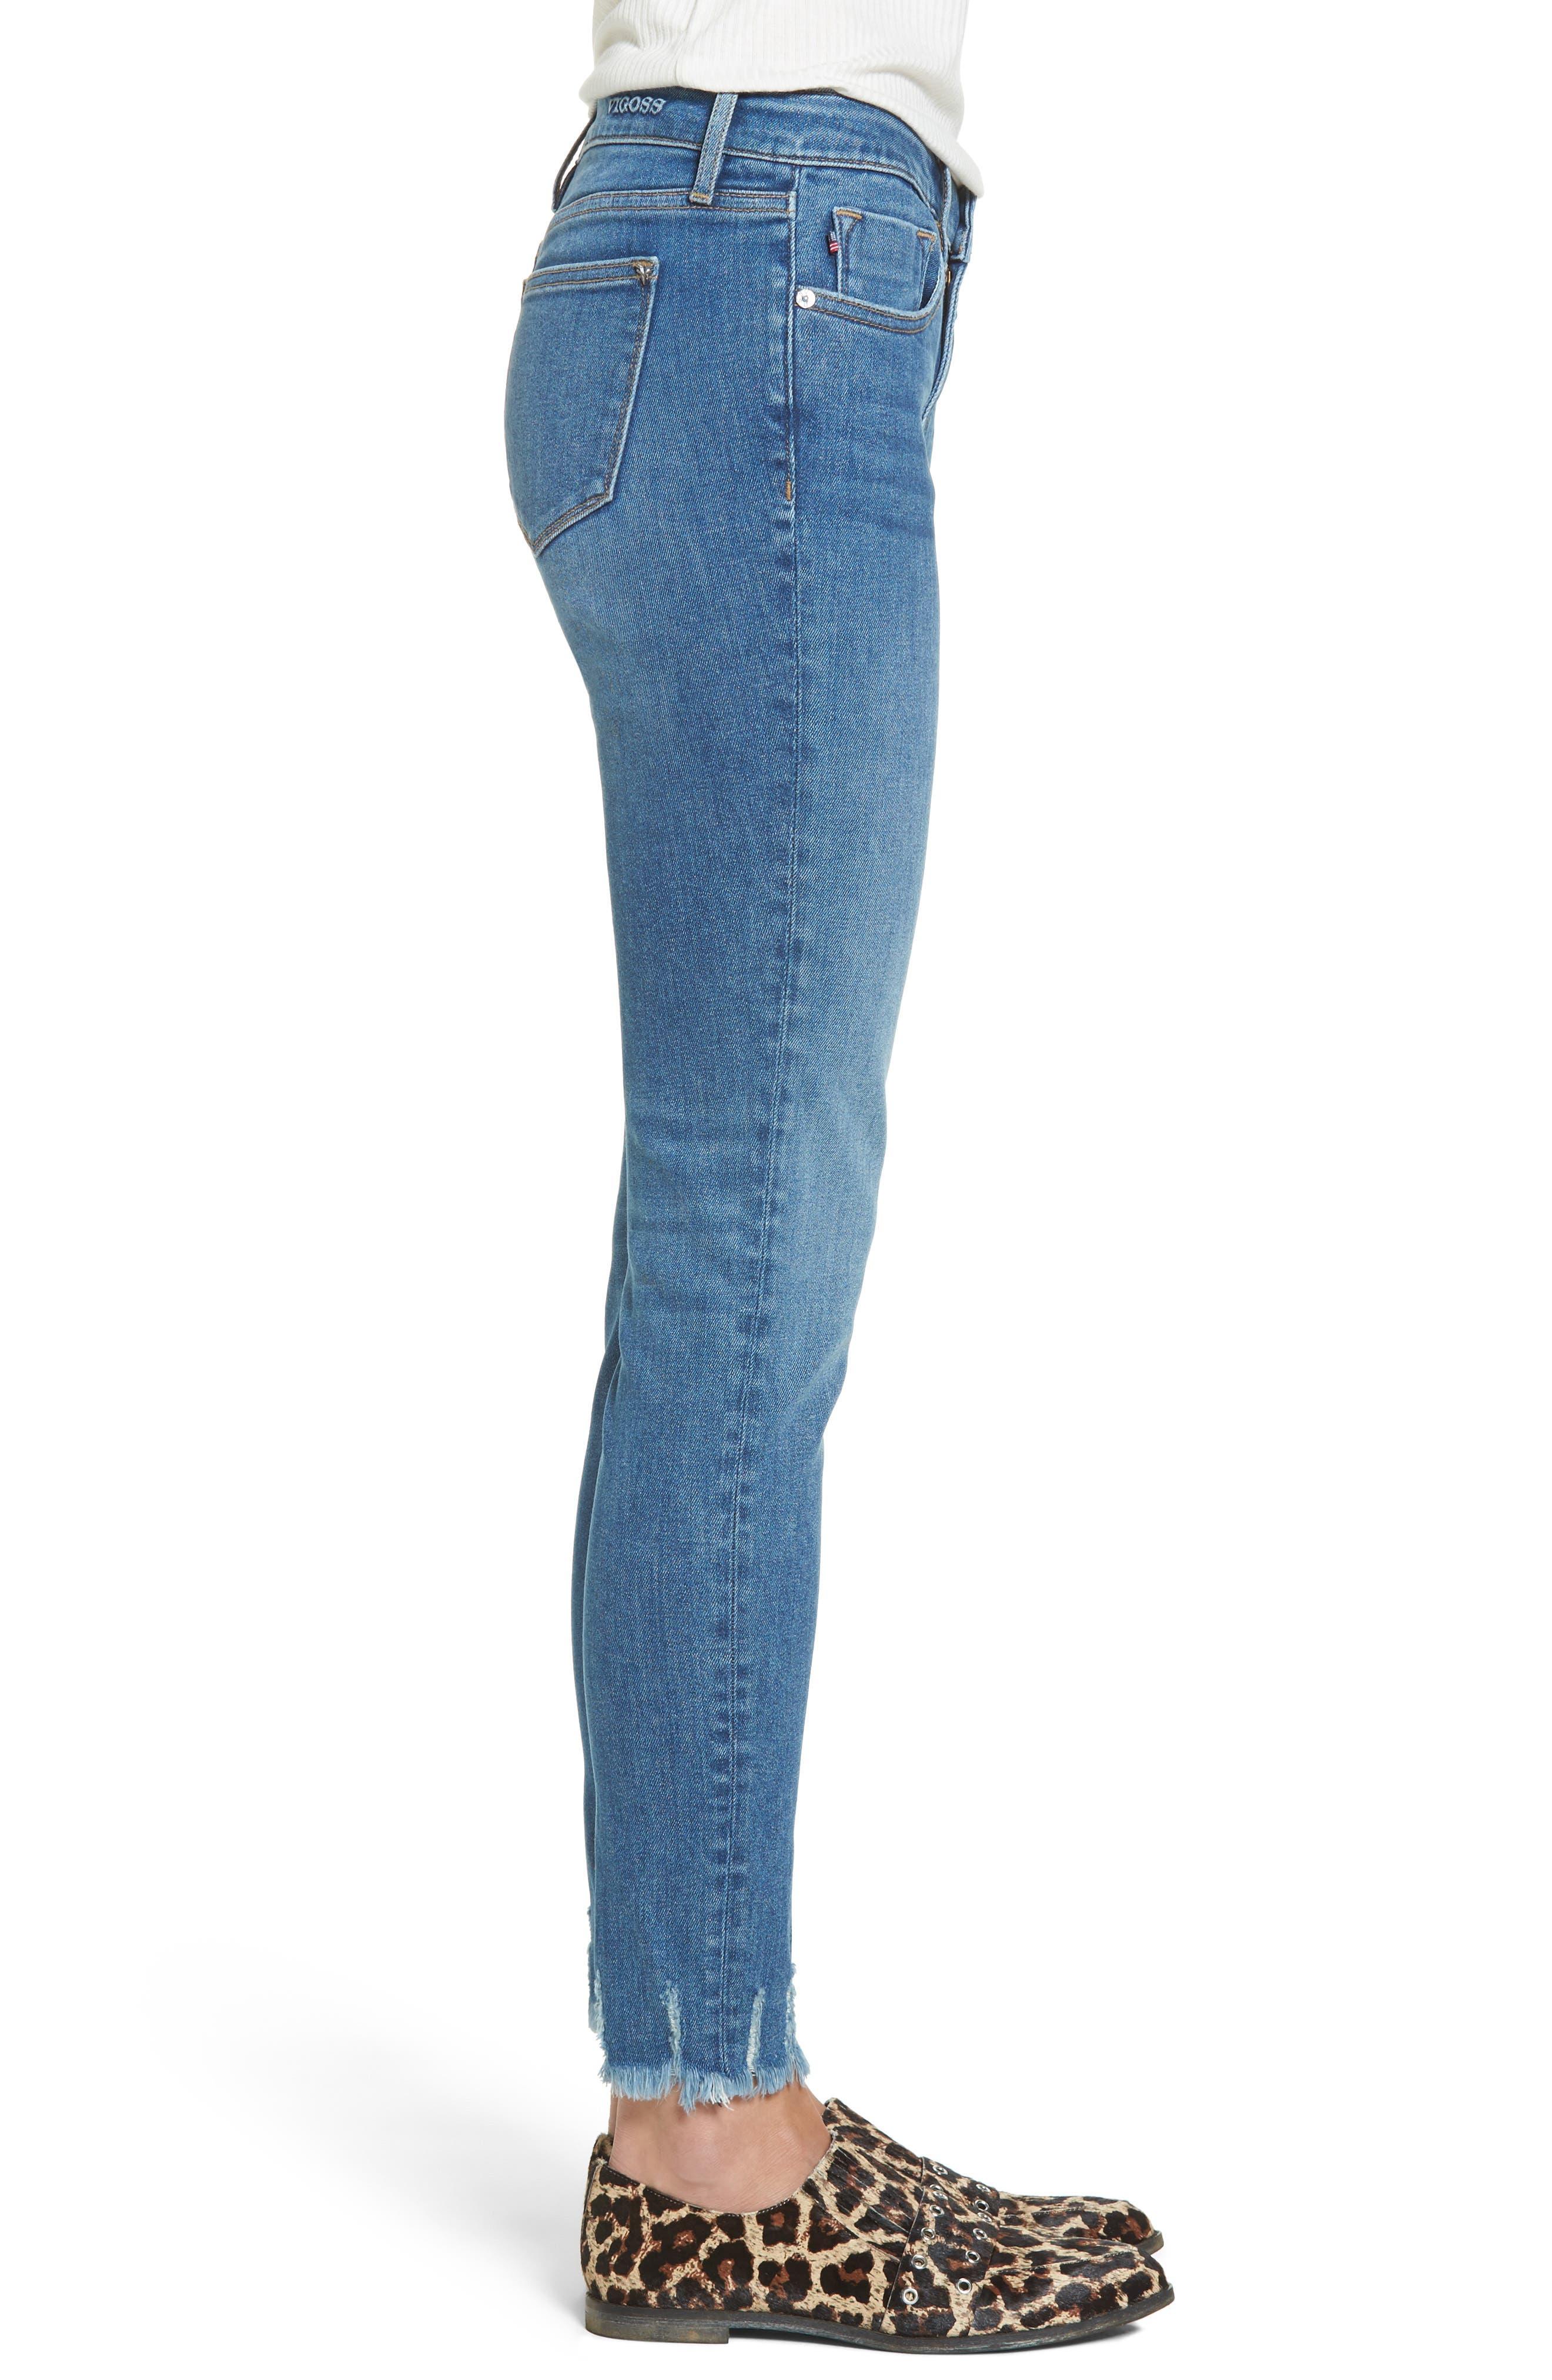 Jagger Skinny Jeans,                             Alternate thumbnail 3, color,